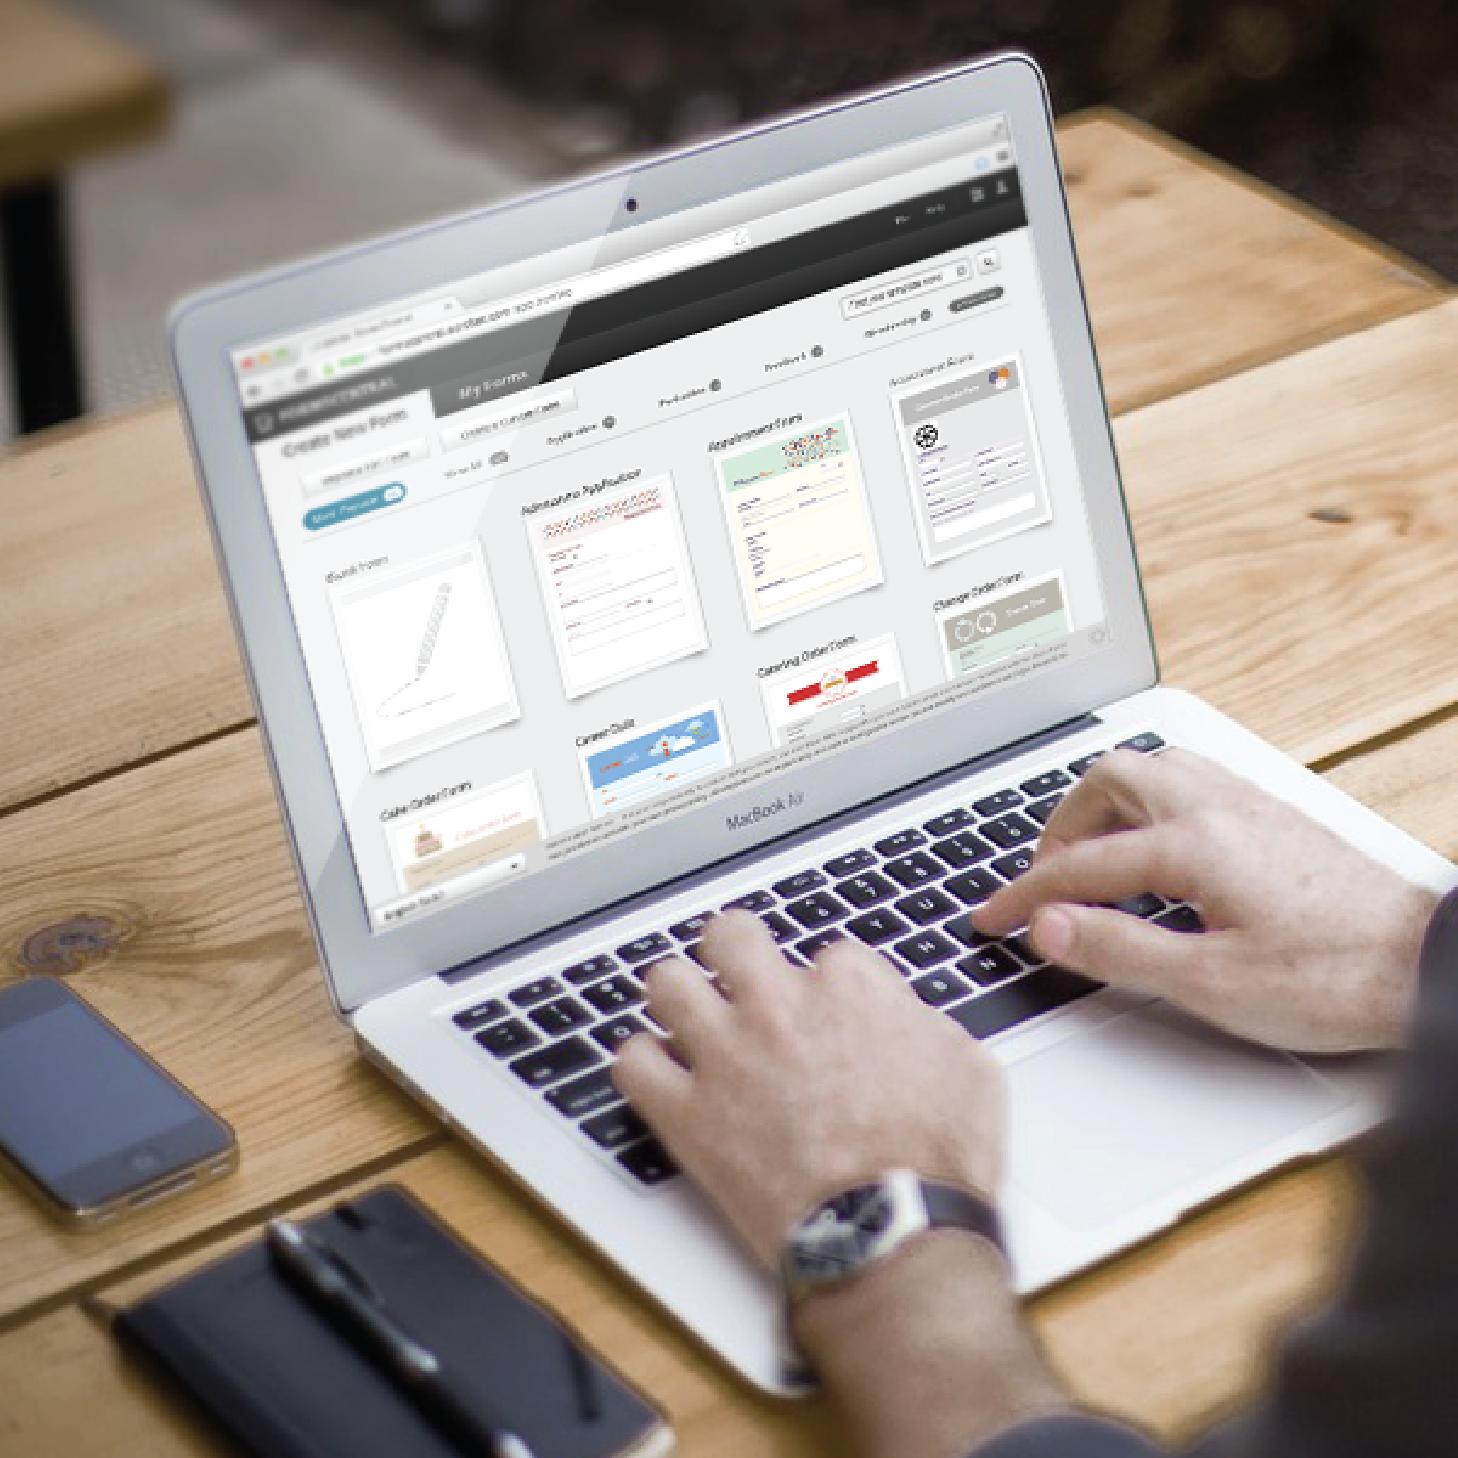 Adobe FormsCentral - Web App